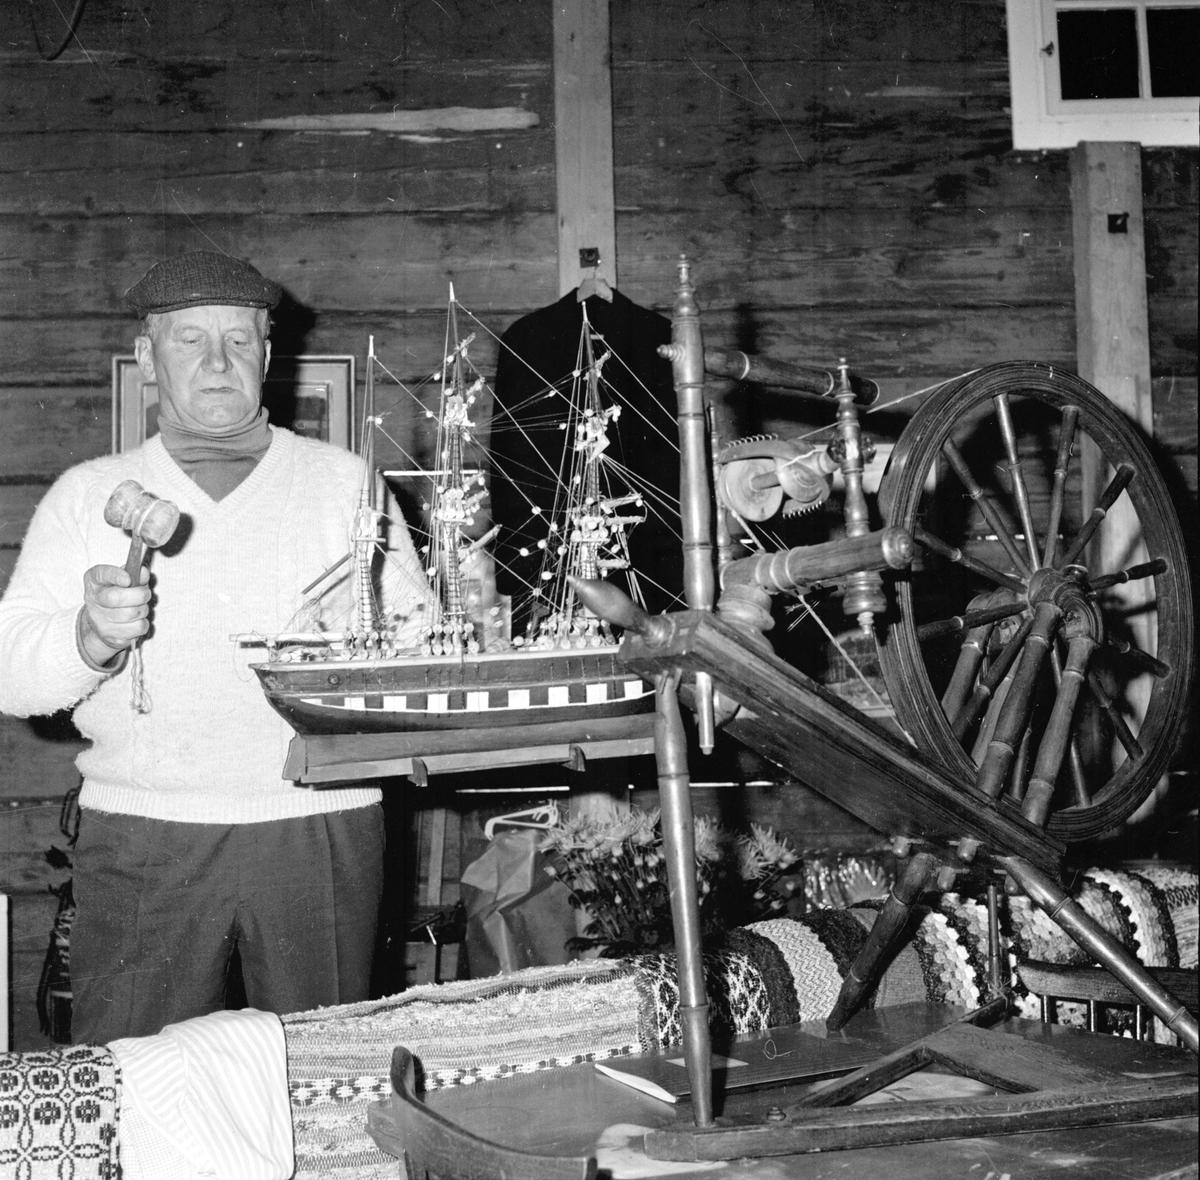 Arbrå, Auktion på Fornhemmet, September 1971